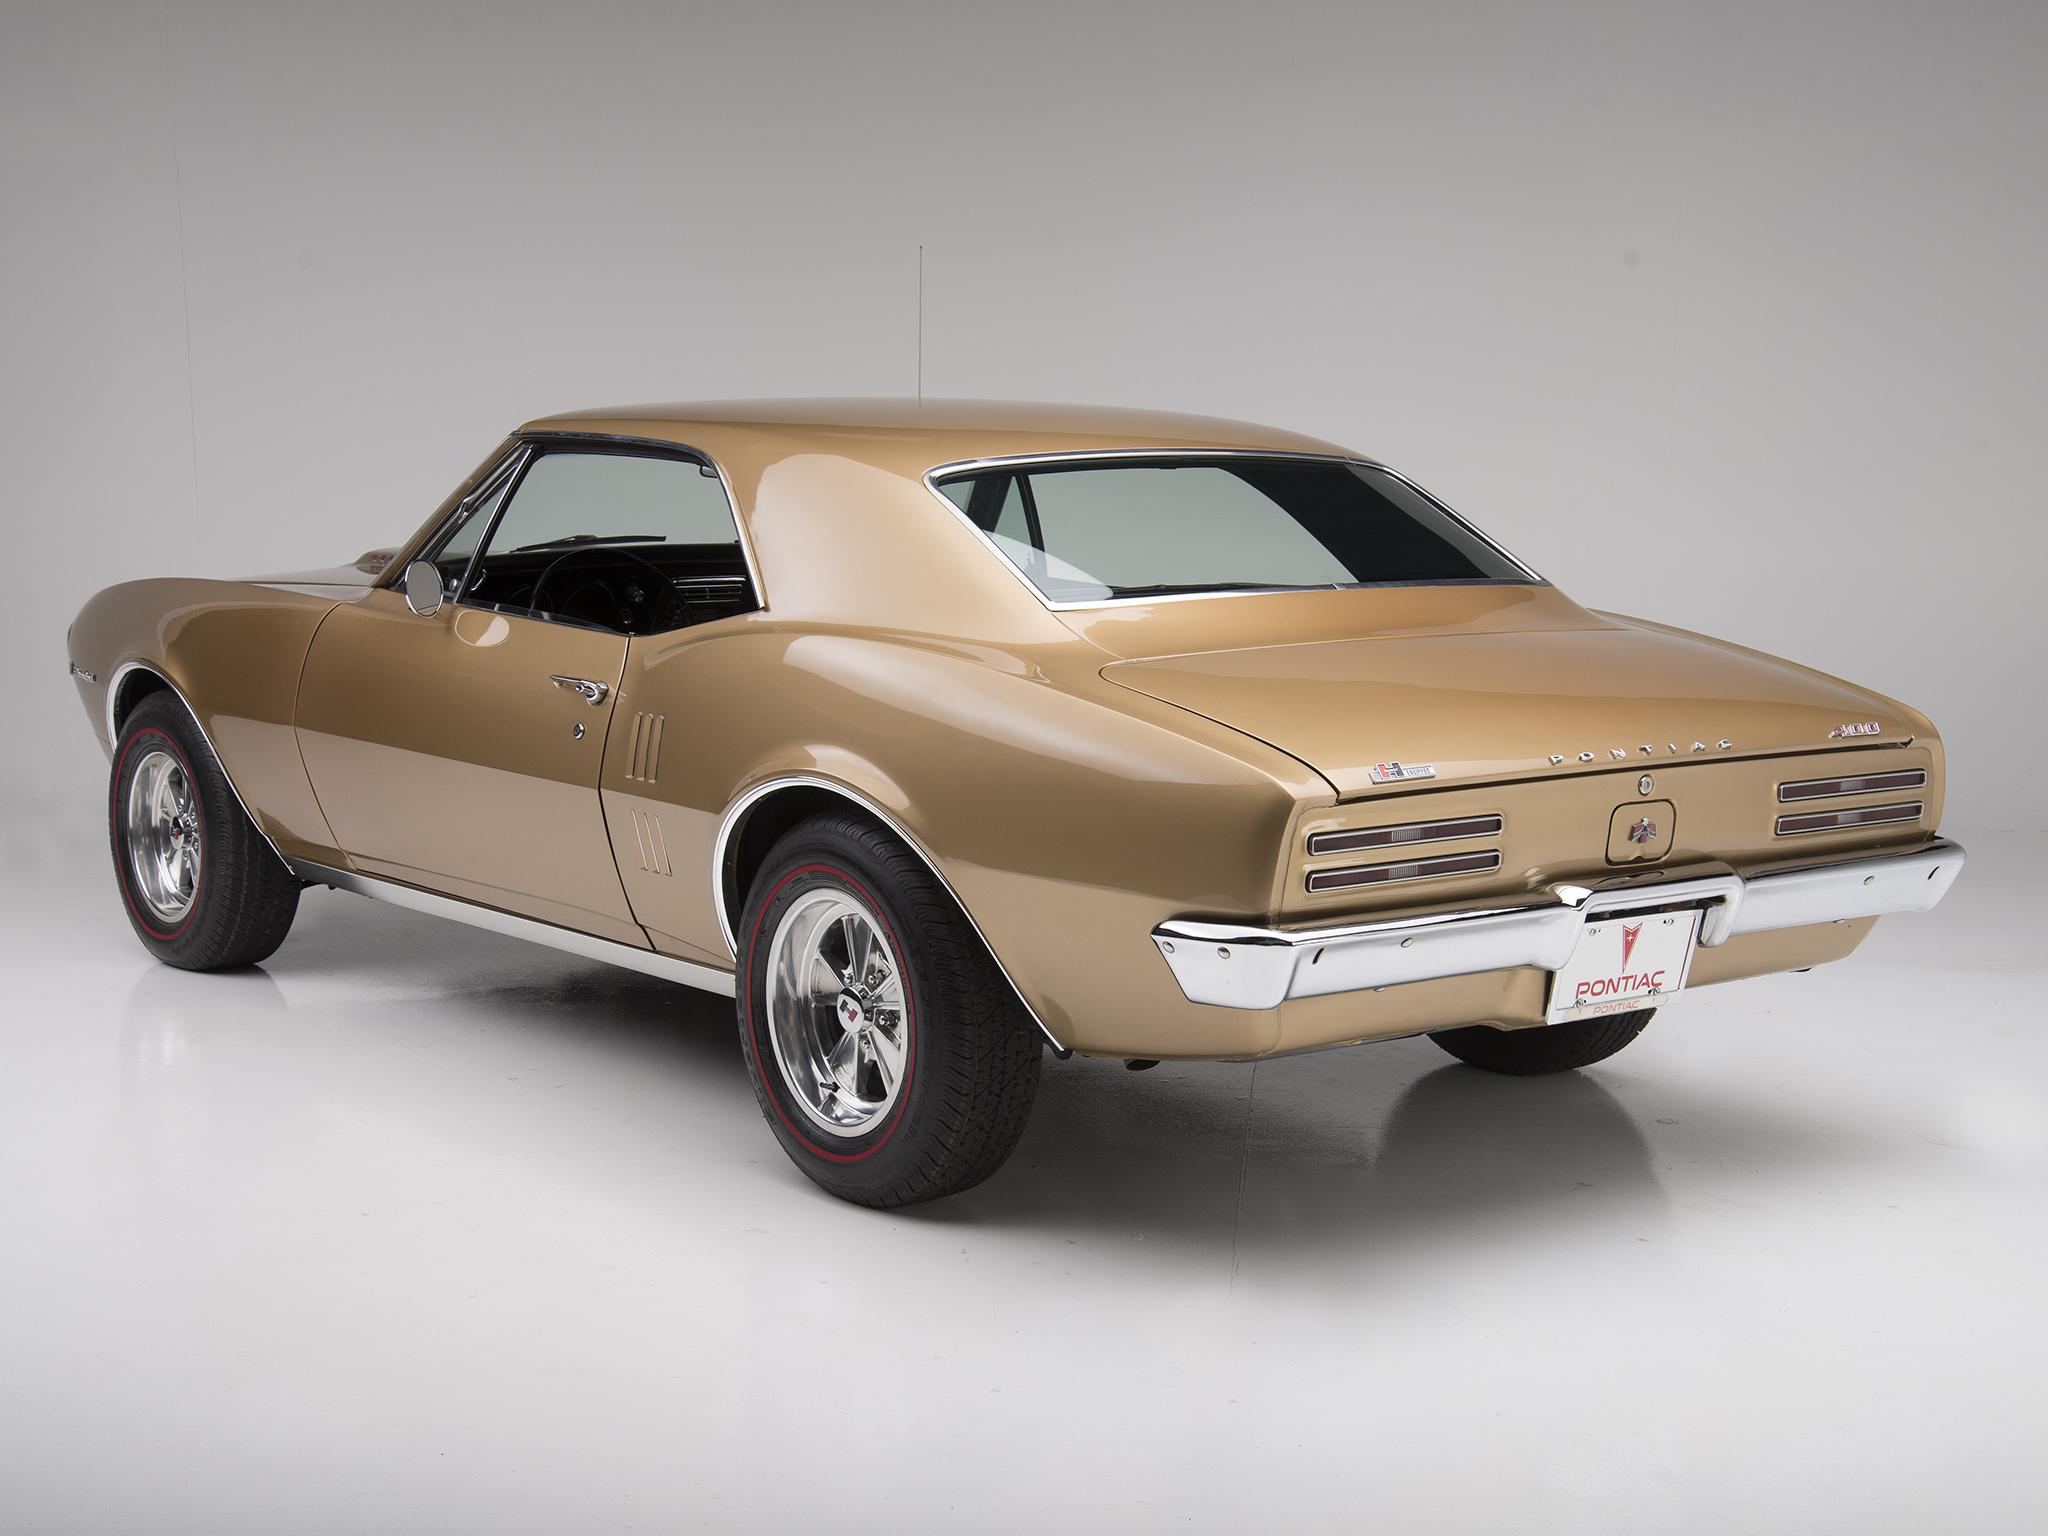 1967 Pontiac Firebird 400 22337 Muscle Classic G